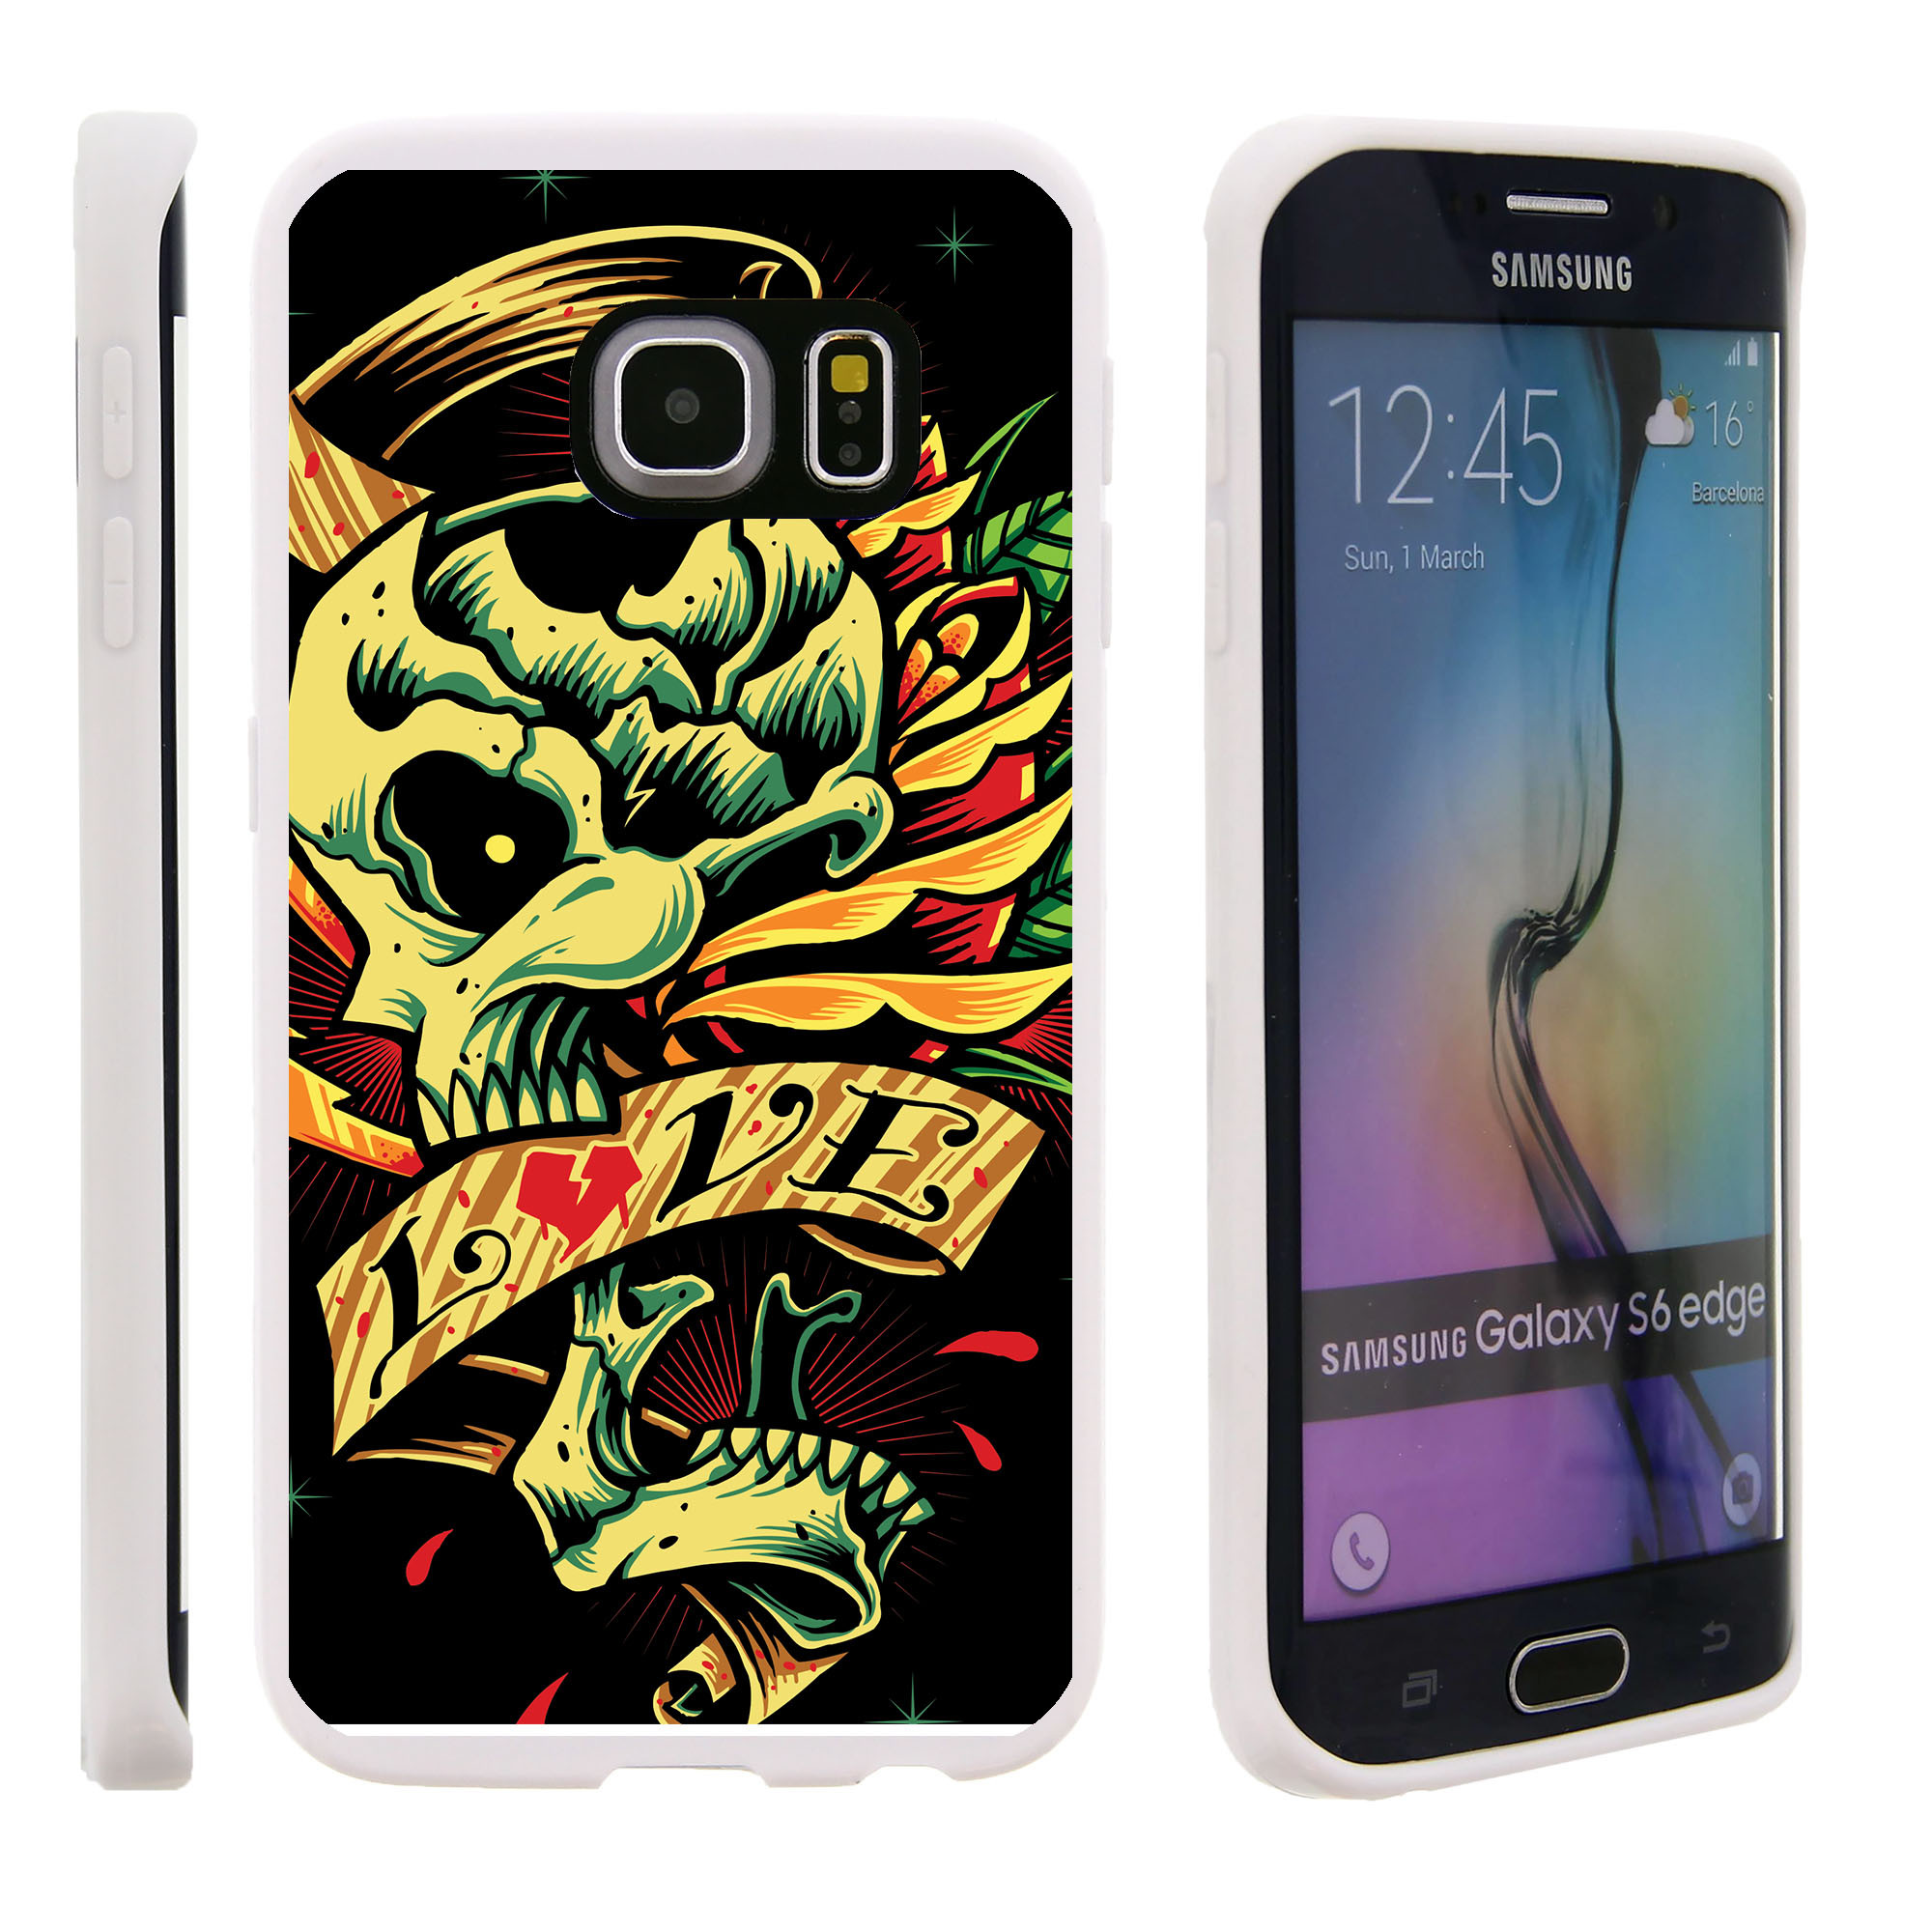 Samsung Galaxy S6 Edge G925, Flexible Case [FLEX FORCE] Slim Durable TPU Sleek Bumper with Unique Designs - Tattoo Skull